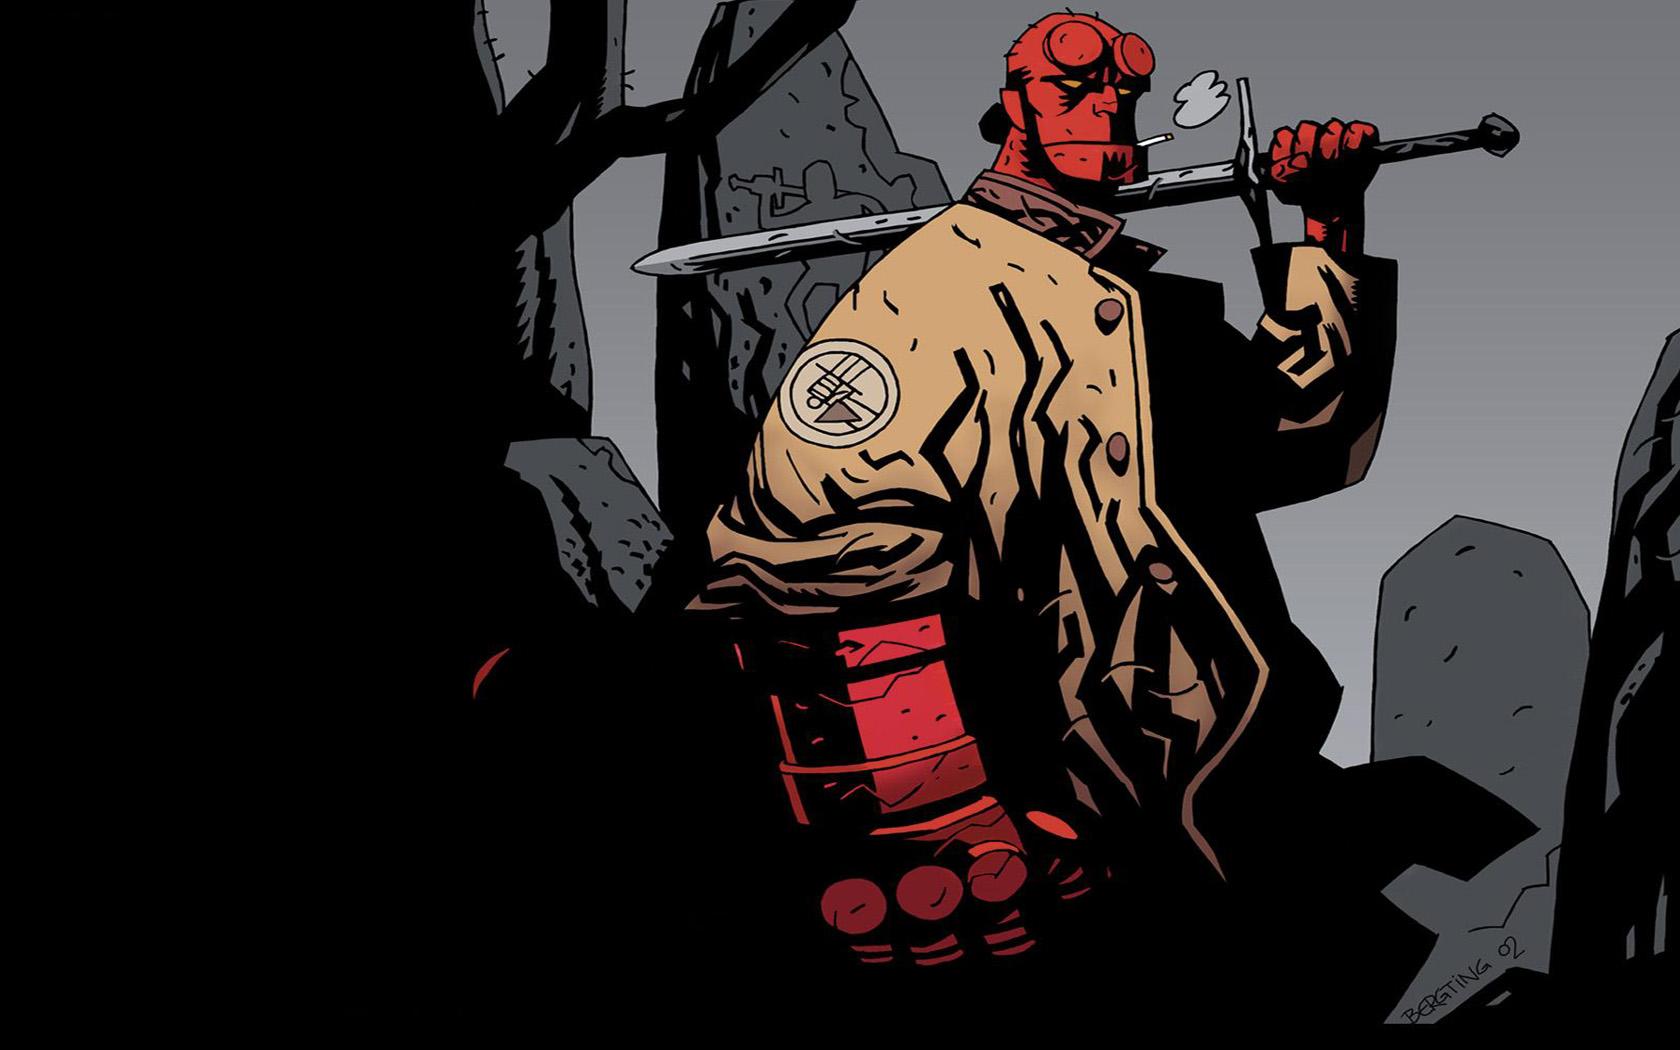 Hellboy Comic Wallpaper 1680x1050 Hellboy Comic 1680x1050